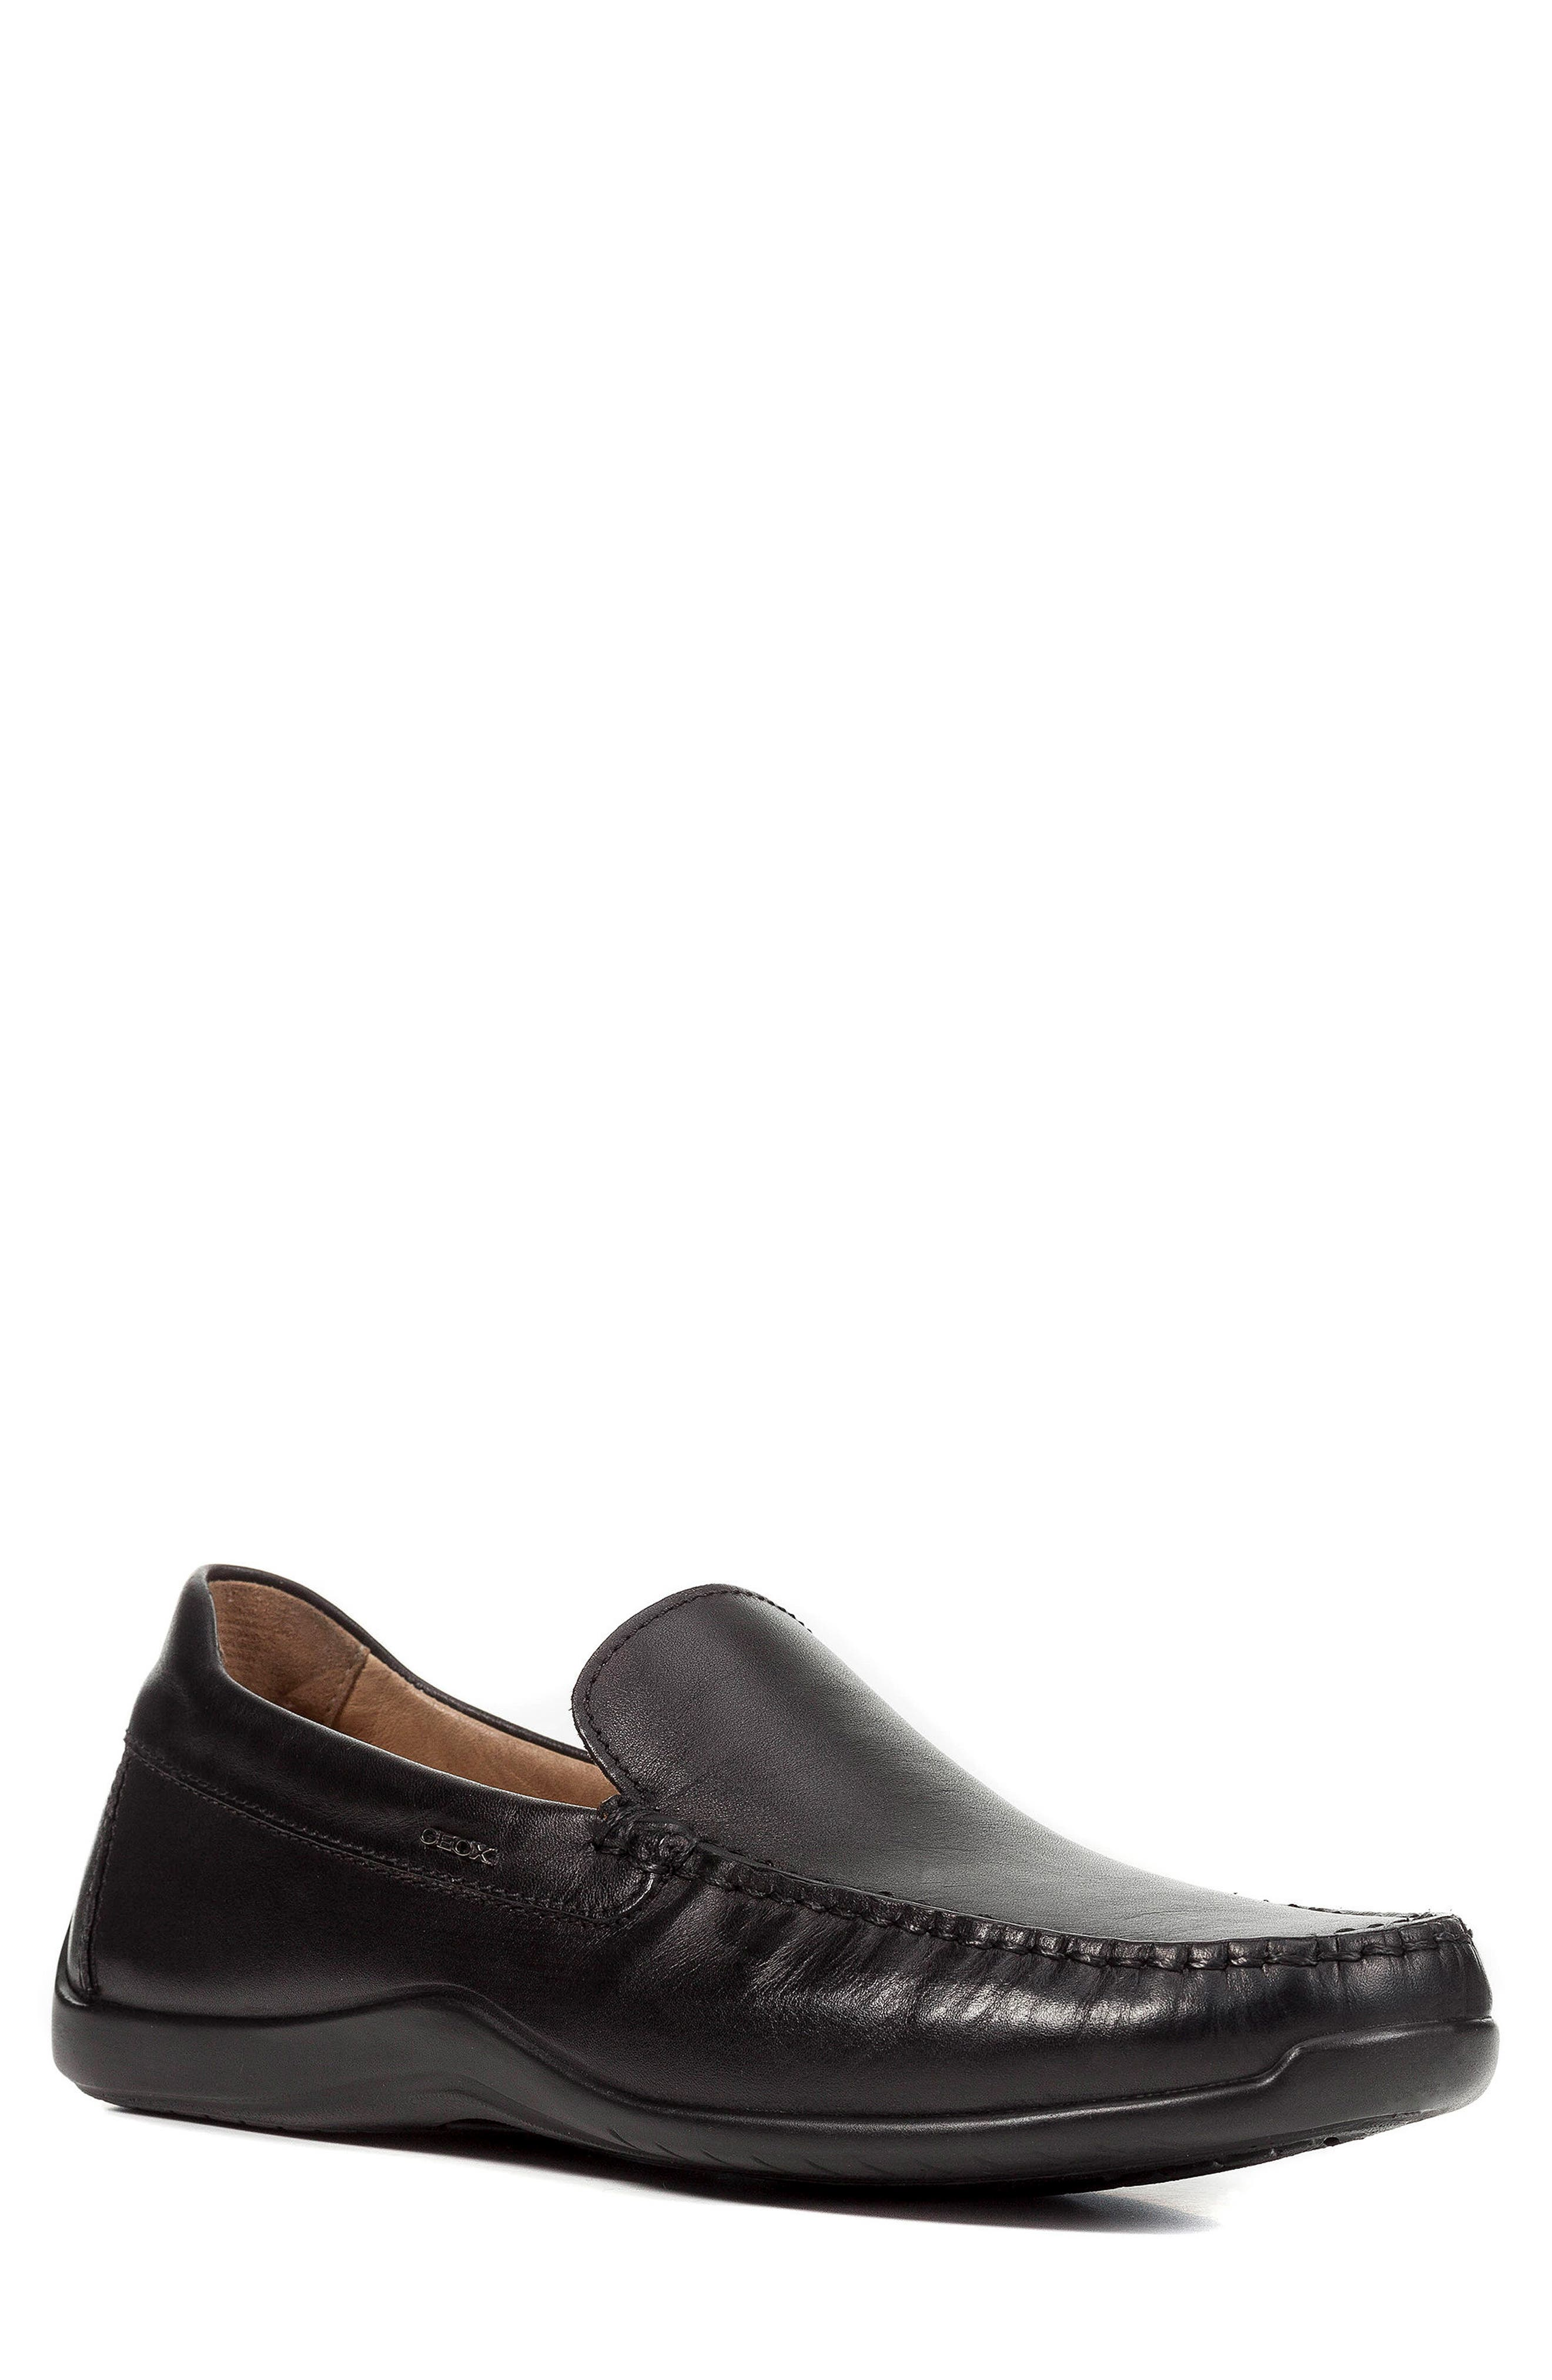 'U Xense Mox' Driving Shoe,                             Main thumbnail 1, color,                             Black Leather